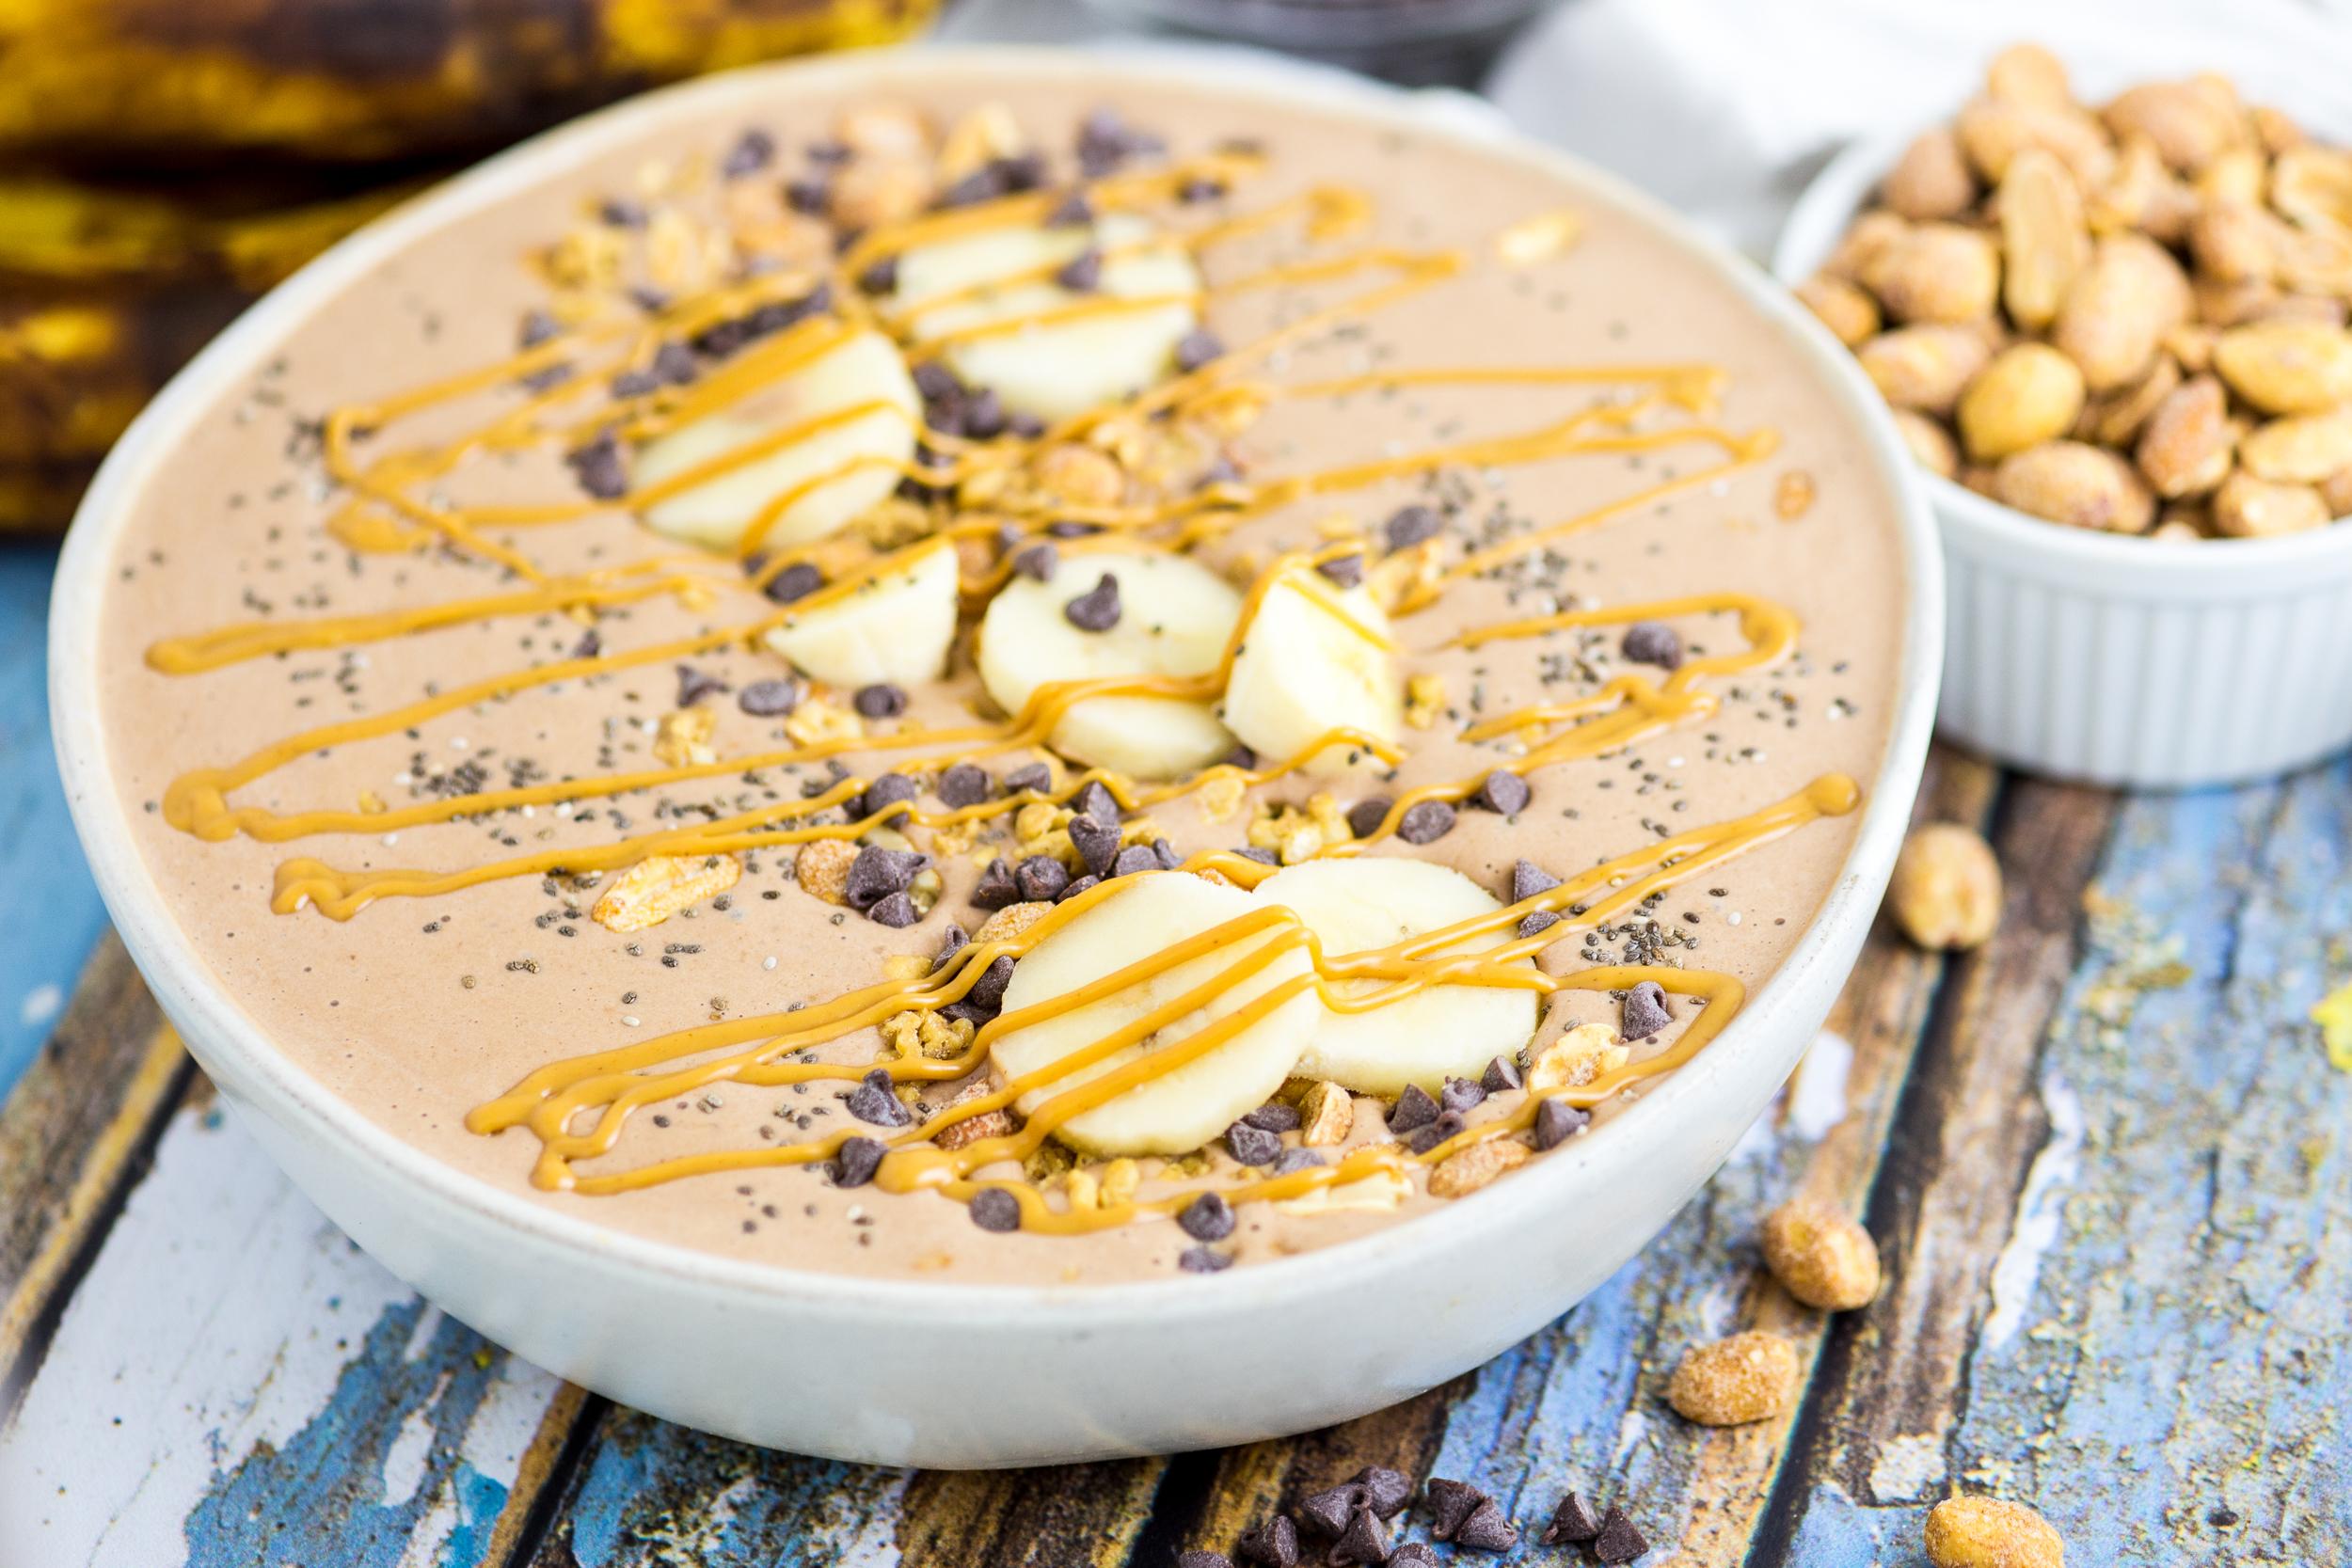 Acai Powder Smoothie Bowl, Chocolate Peanut Butter Smoothie Bowl, Smoothie Bowl Recipe, Easy Smoothie Bowl